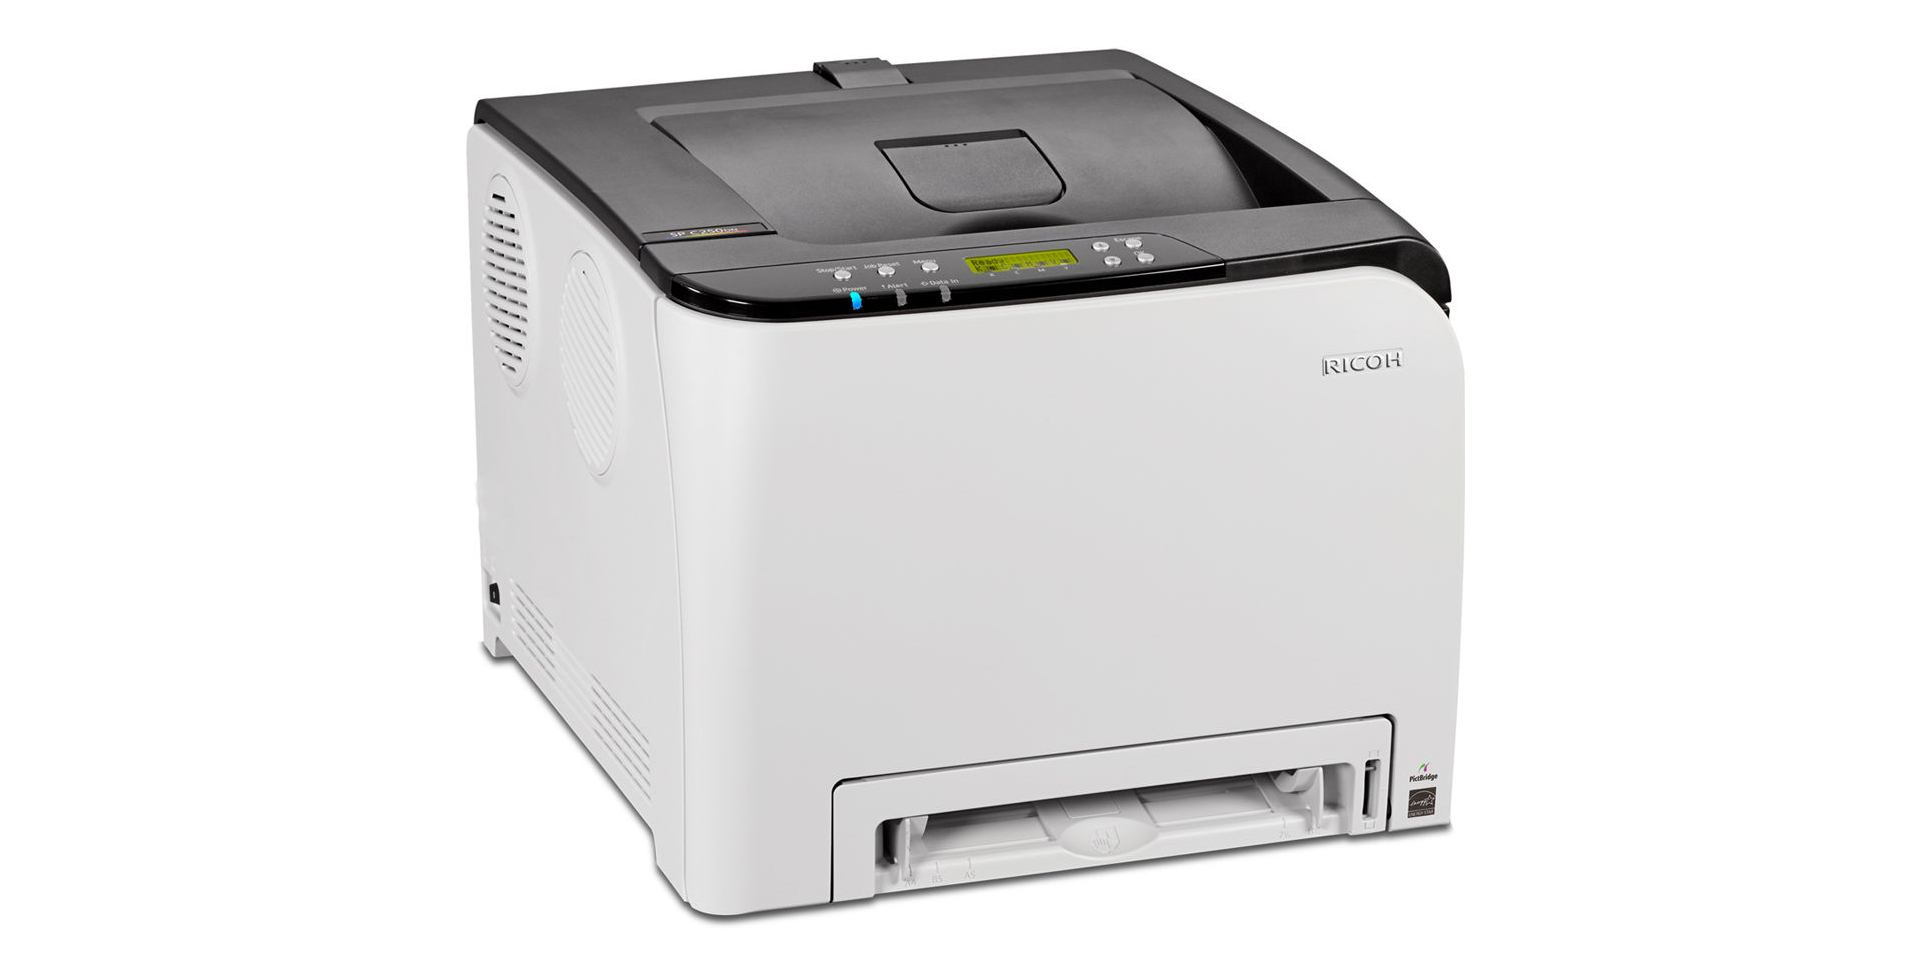 ricoh-color-laser-printer